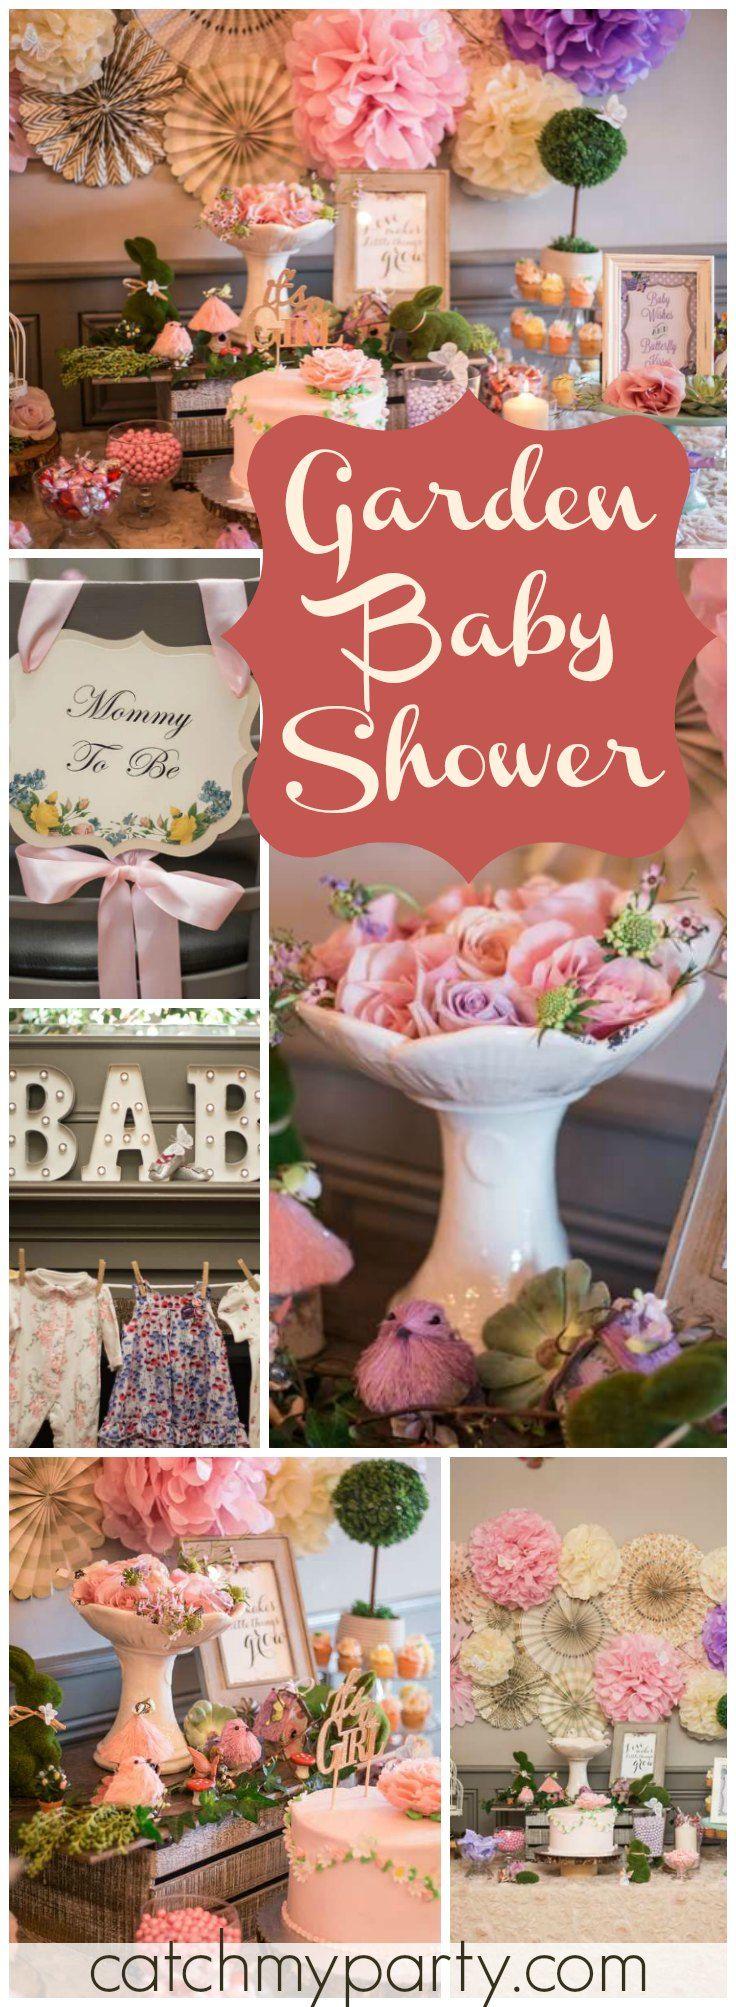 25 Best Ideas About Tea Party Baby Shower On Pinterest Tea